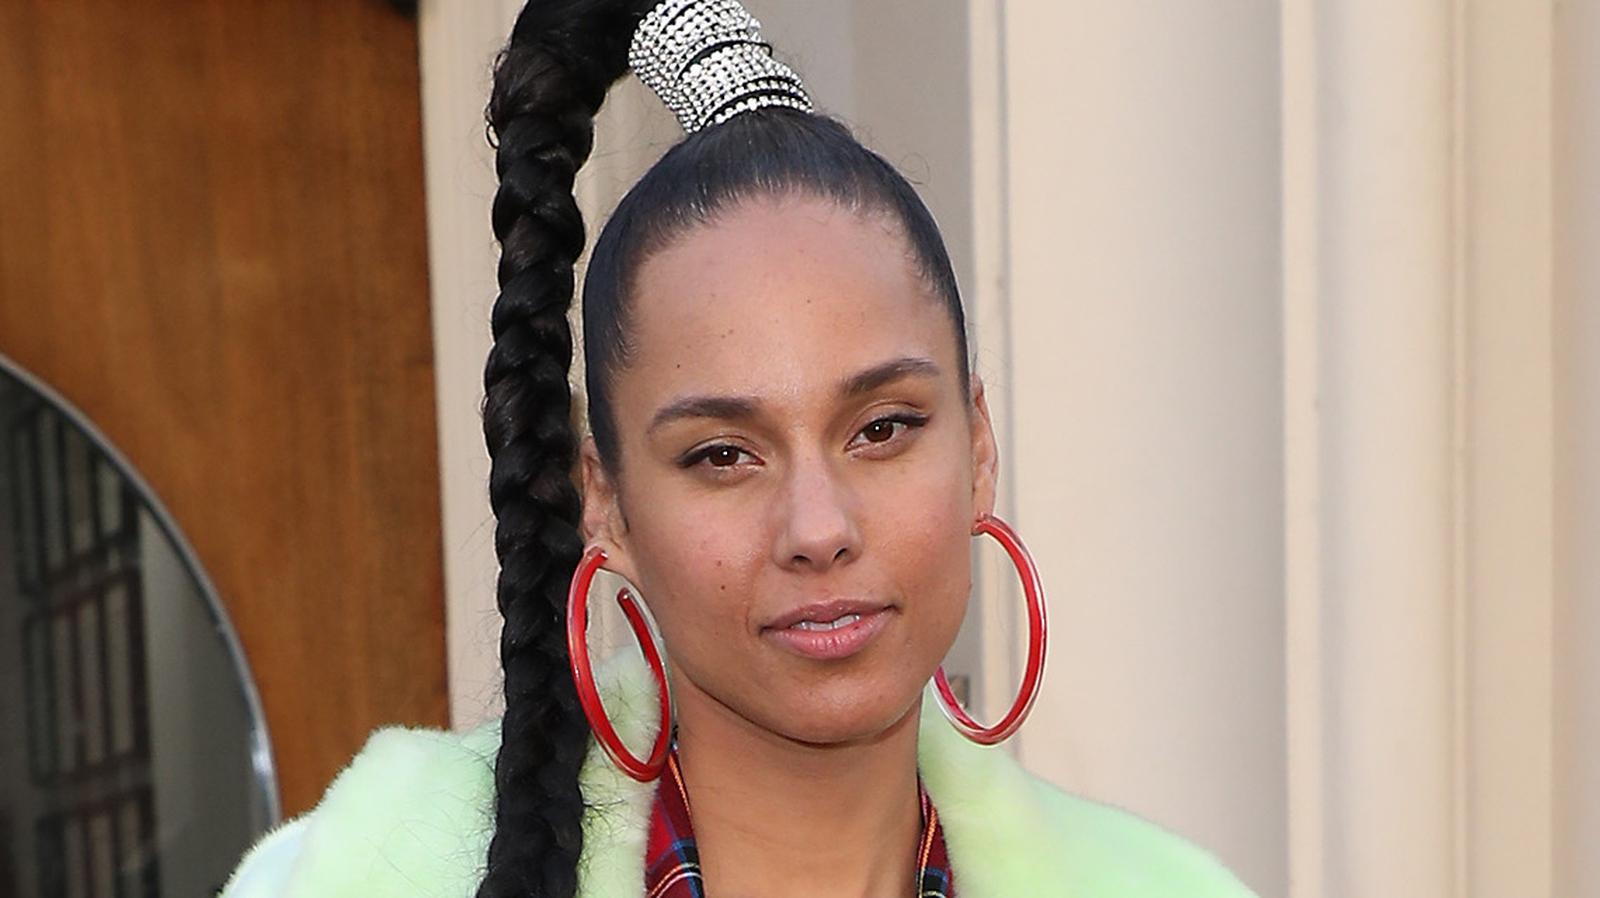 Alicia Keys Says No Justice For Breonna Taylor Lyrics to 'nobody else' by alicia keys. alicia keys says no justice for